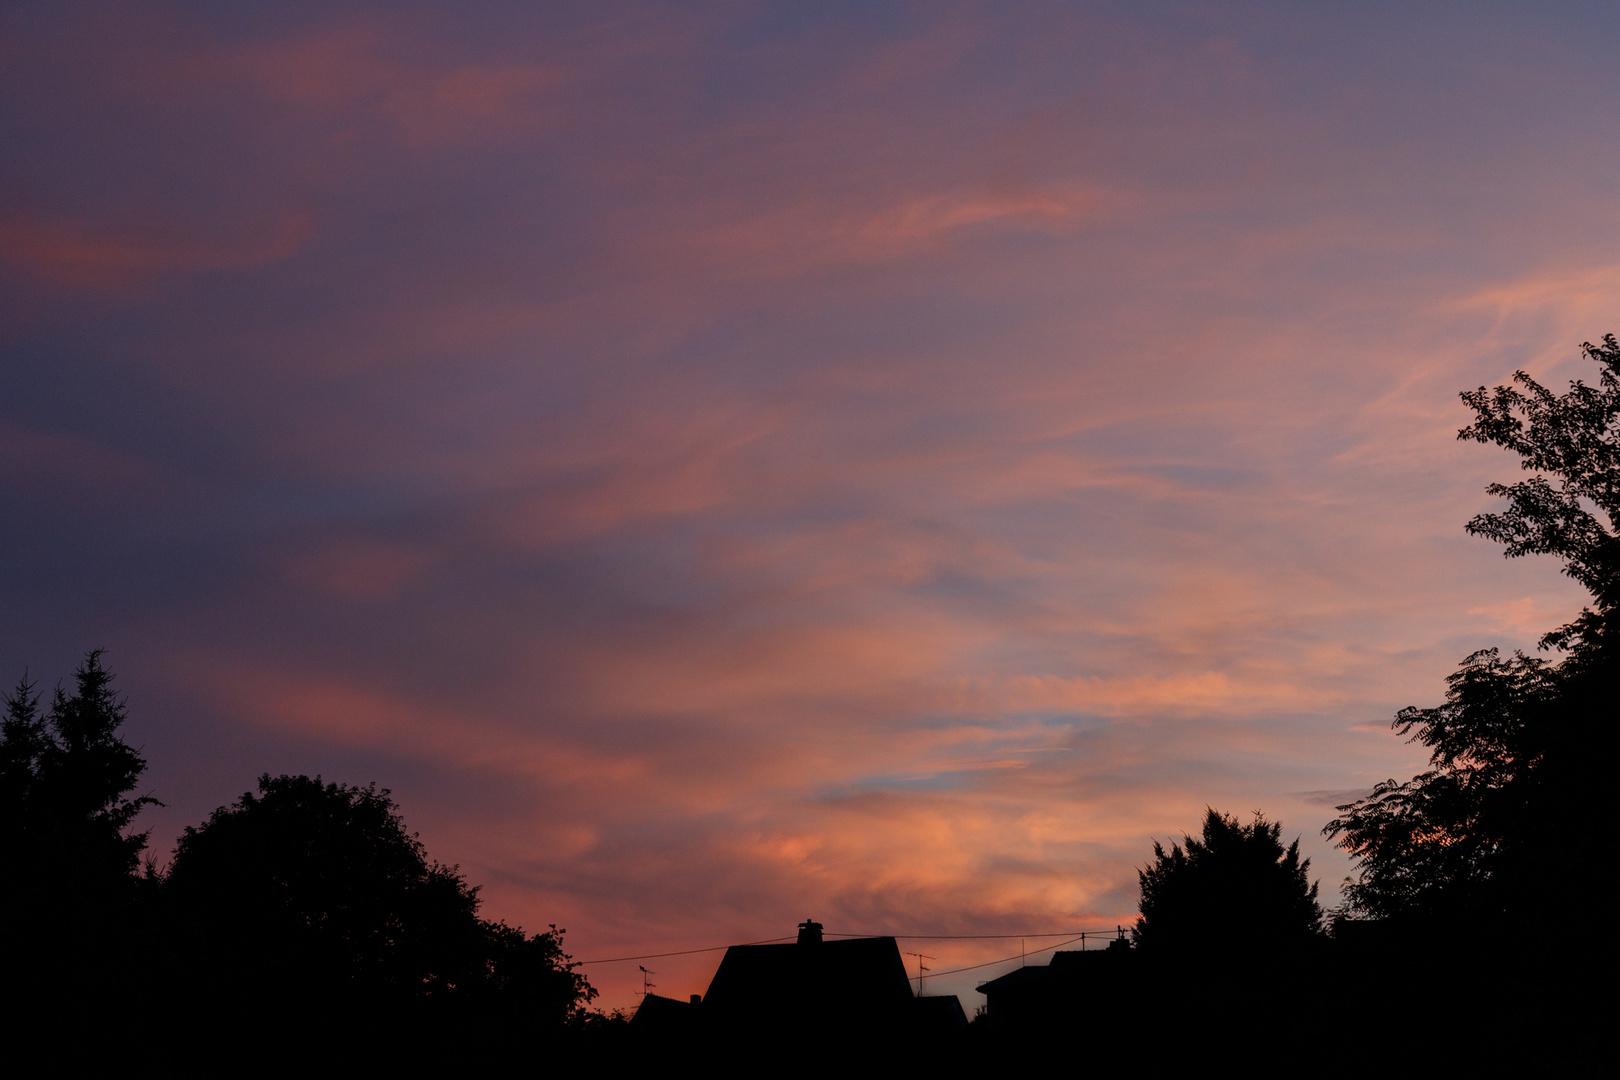 Sonnenuntergang am 05.08.13